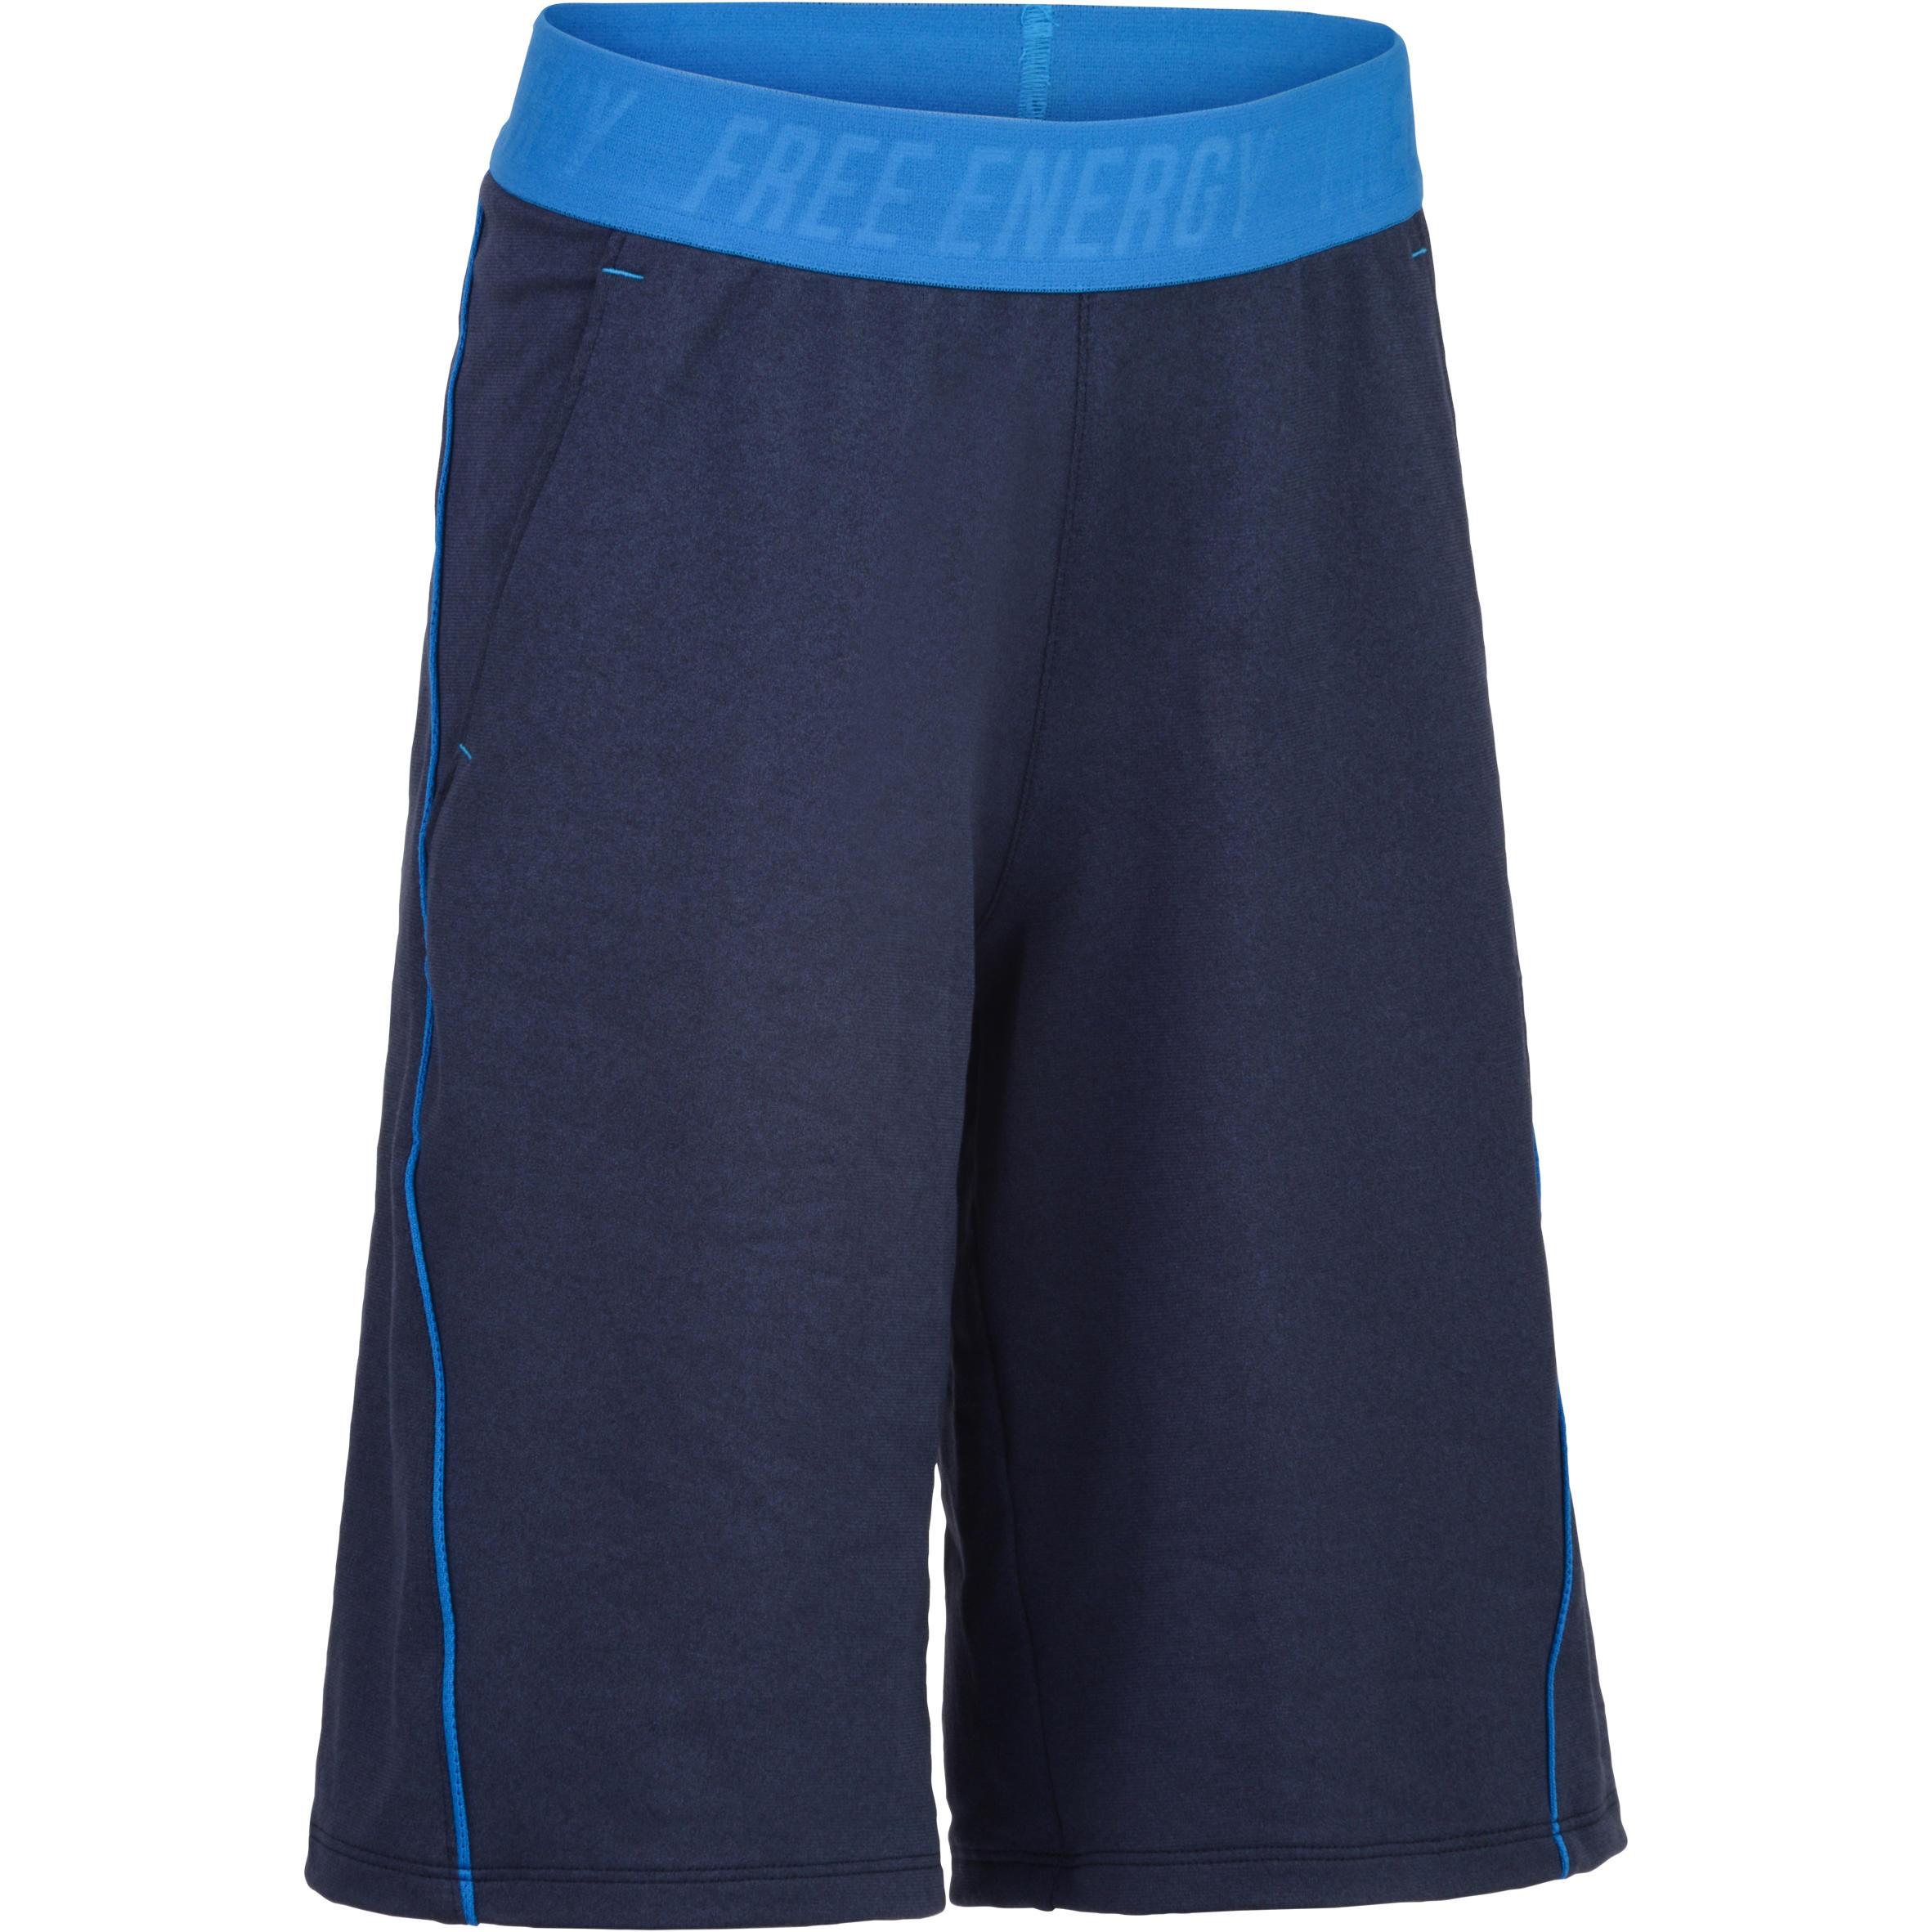 Short 960 gym garçon bleu